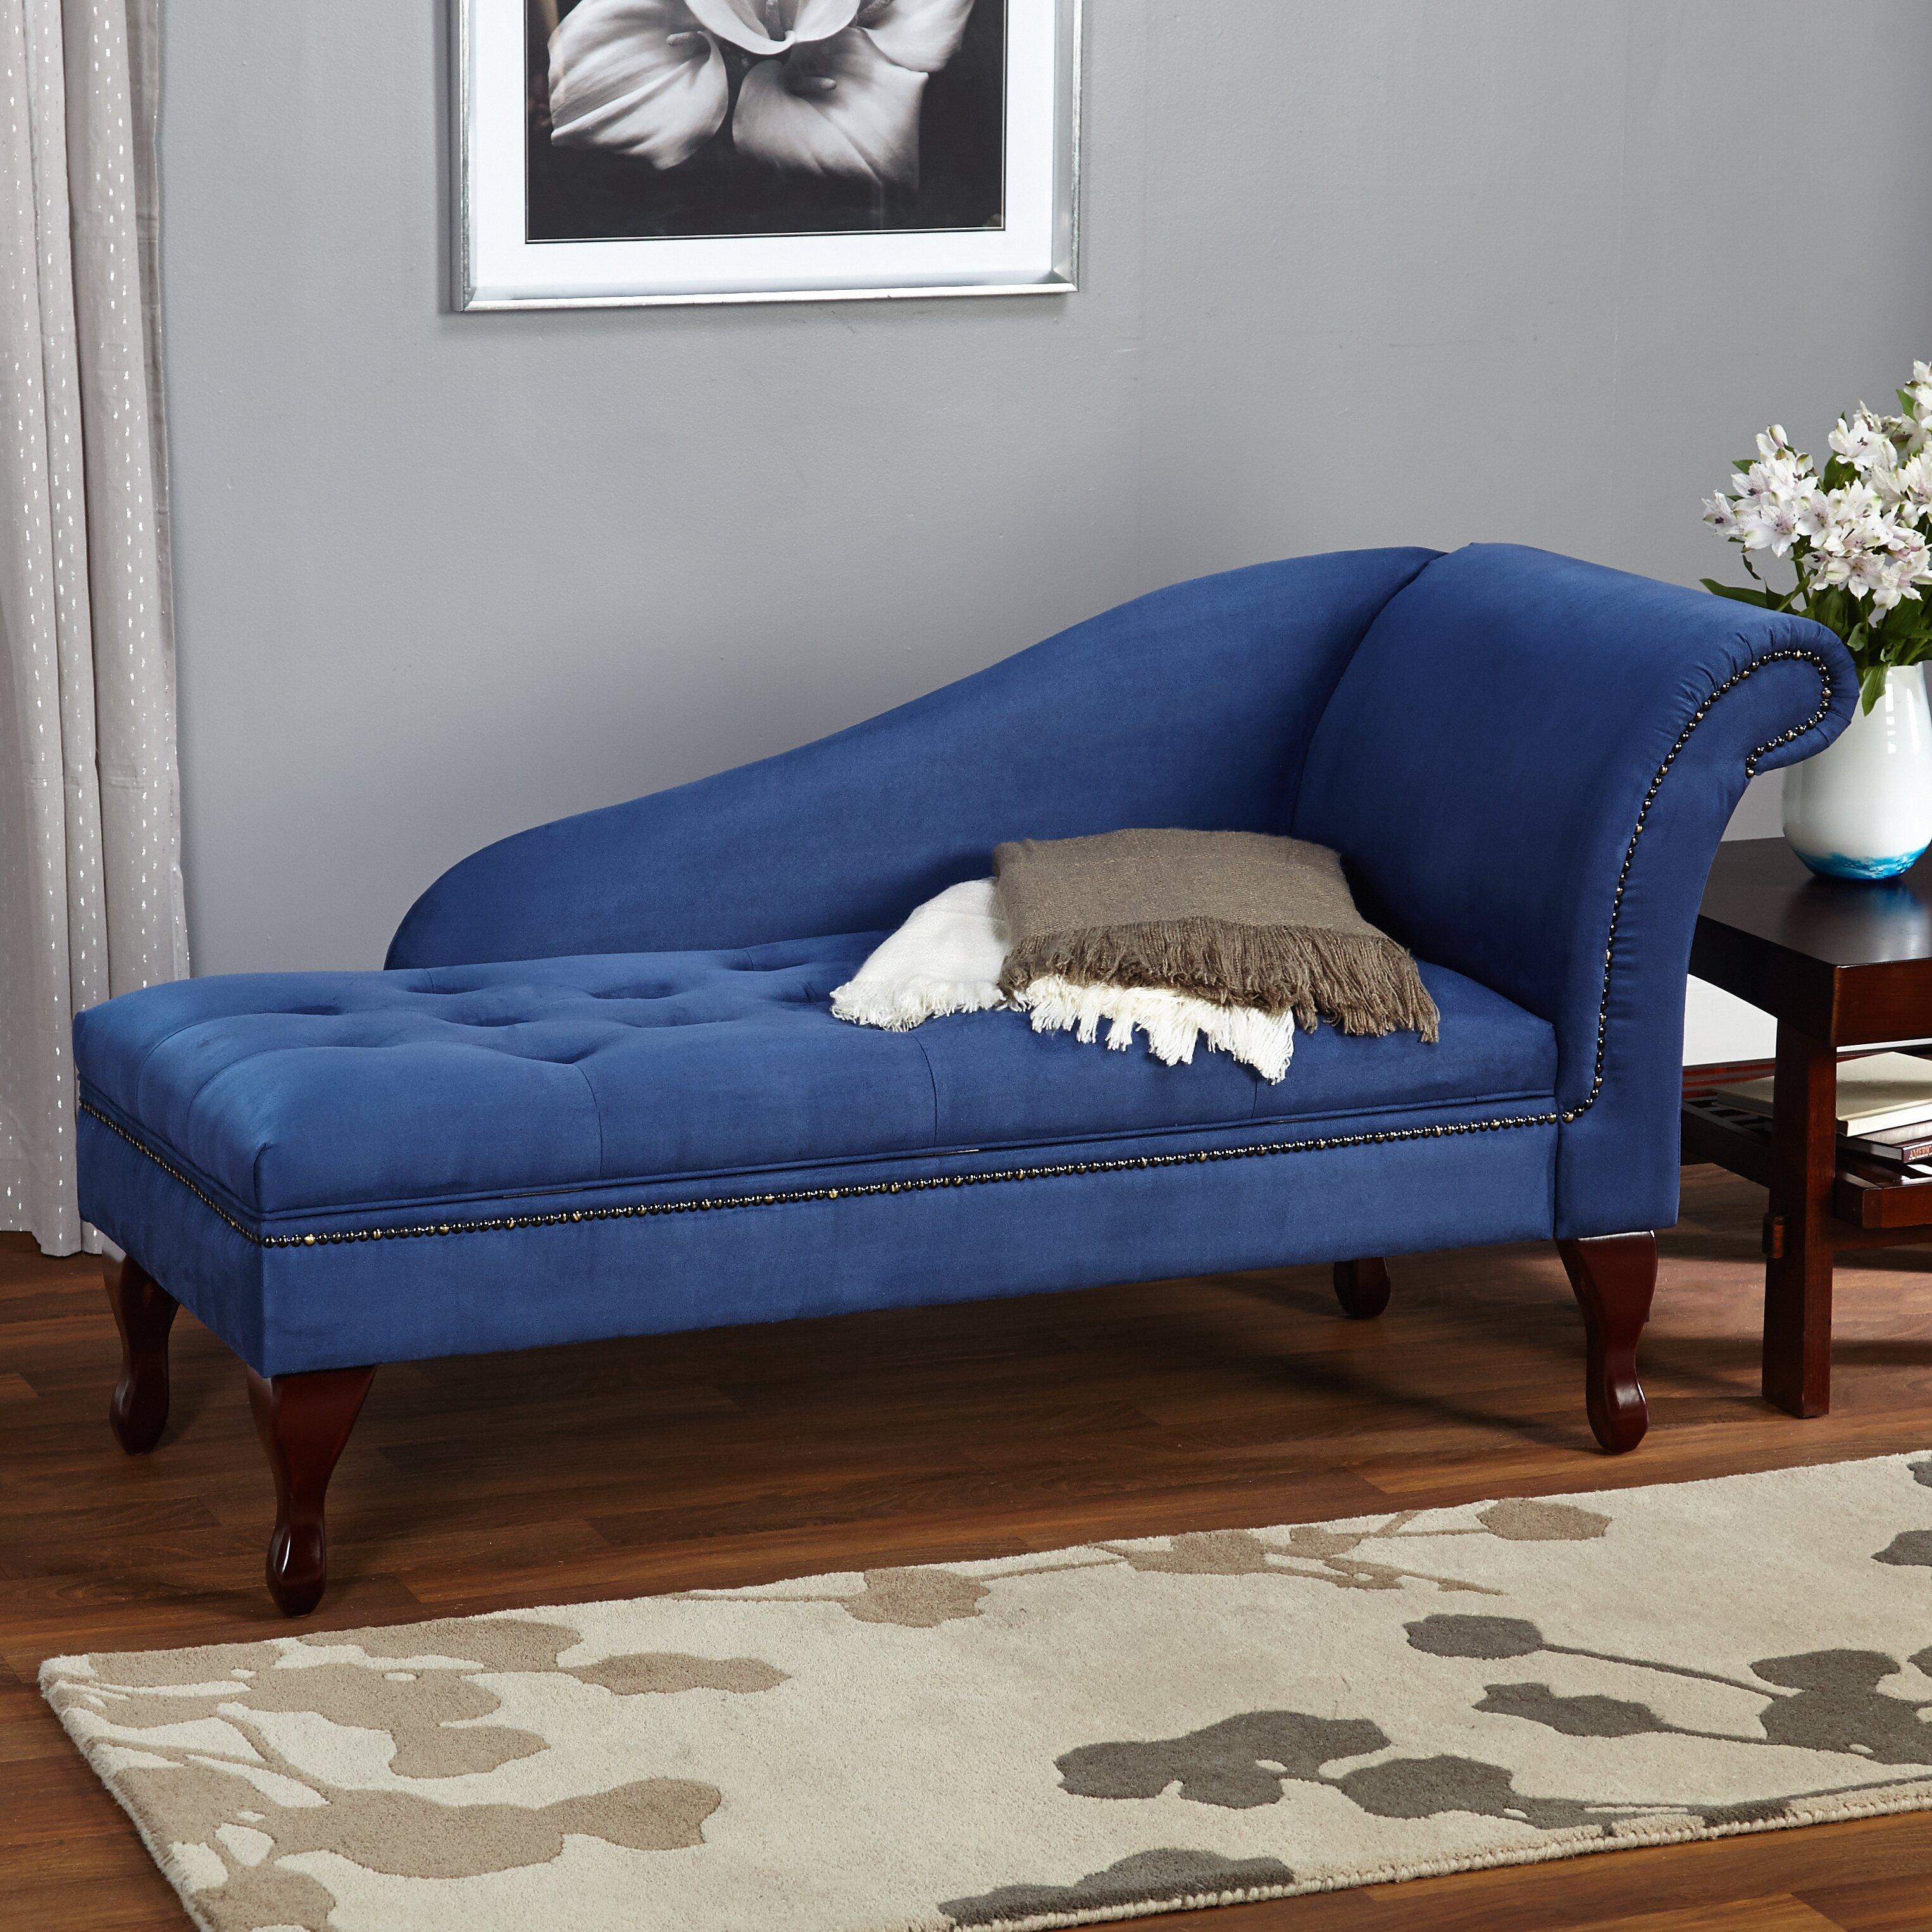 Shayla storage chaise lounge reviews joss main for Ashland chaise storage lounge